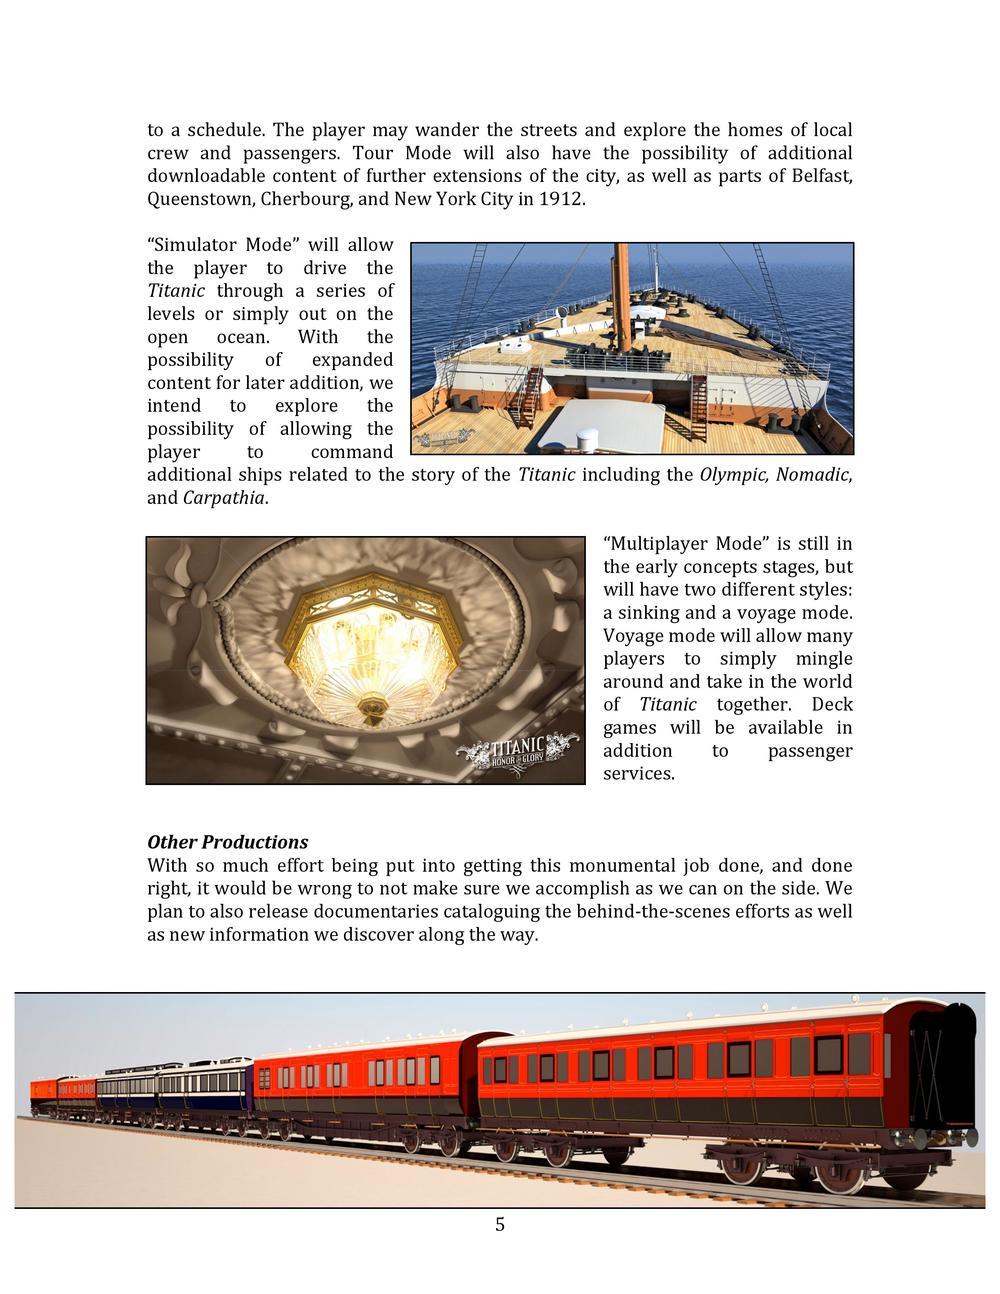 Press Release 1c-page-005.jpg